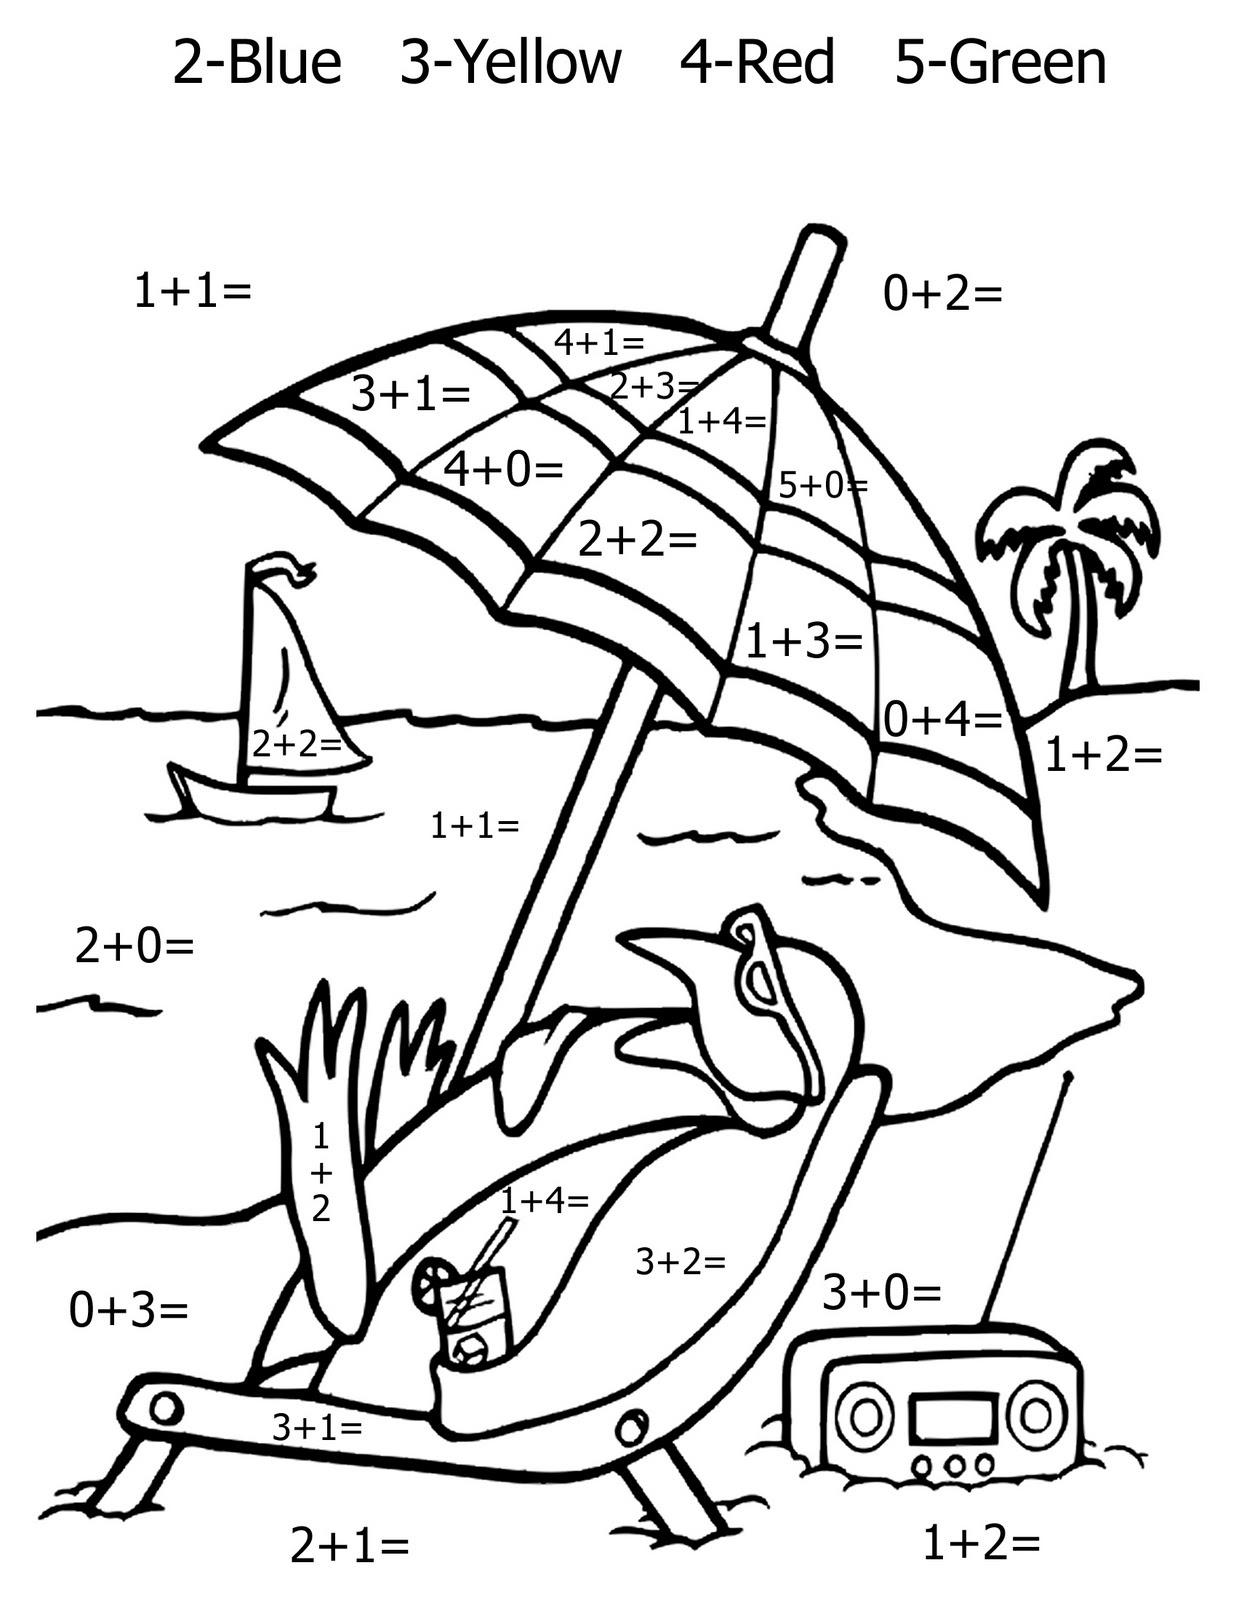 Coloring Ideas : Multiplication Coloring Worksheets Ideas Math - Free Printable Math Coloring Sheets